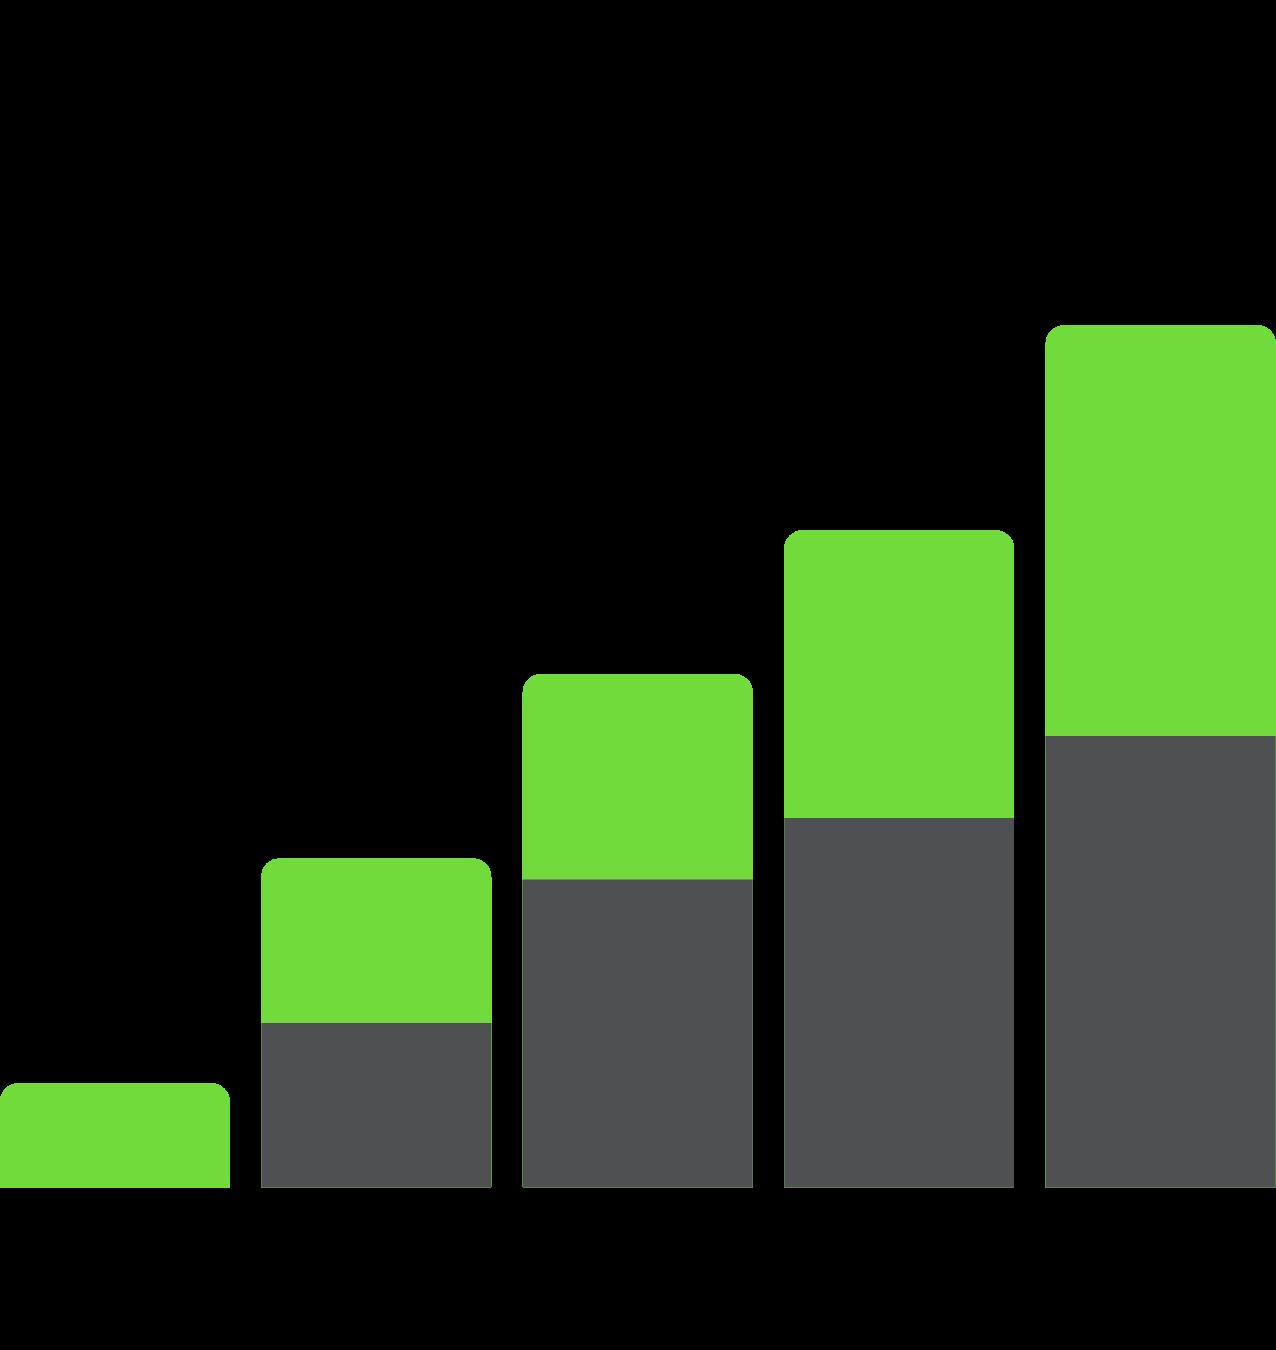 Reach 15-25 y.o. globally through our mobile sampling technology